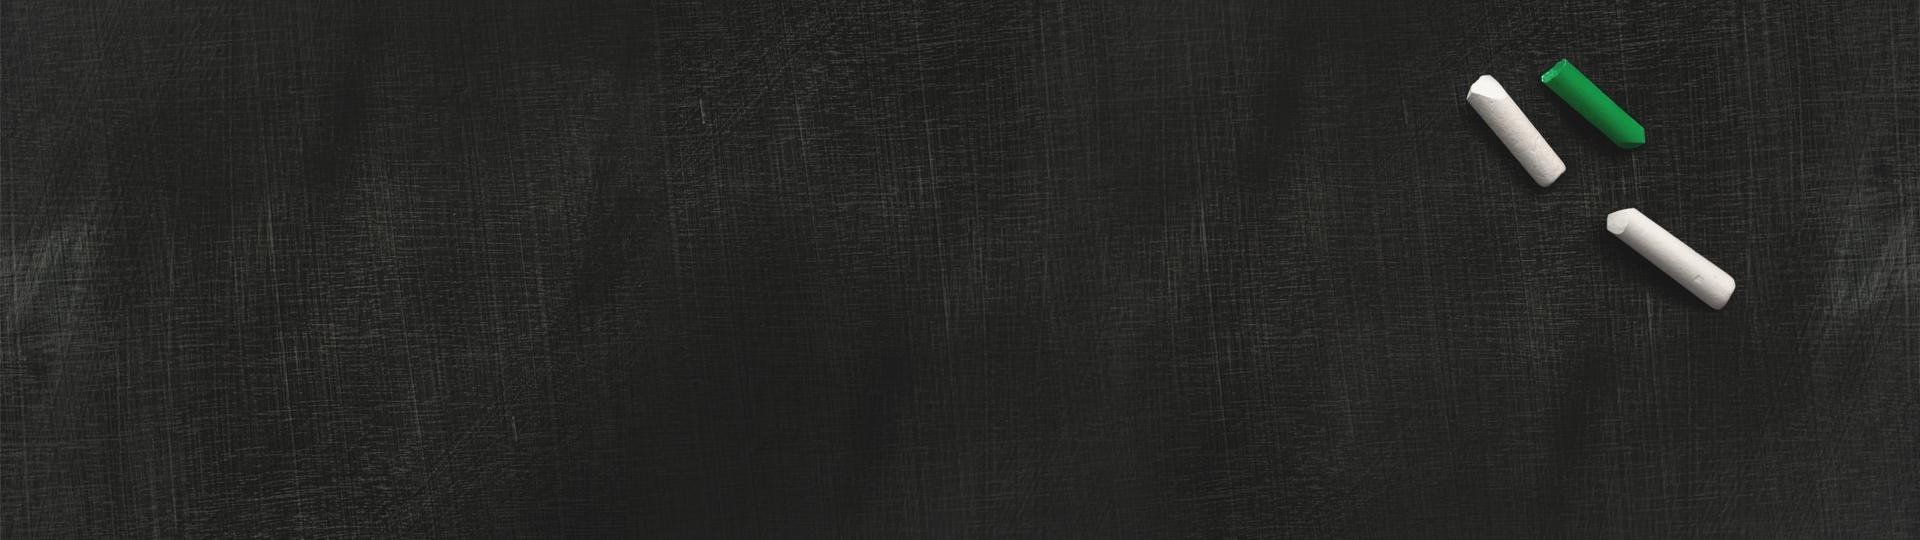 Header qsd blackboard